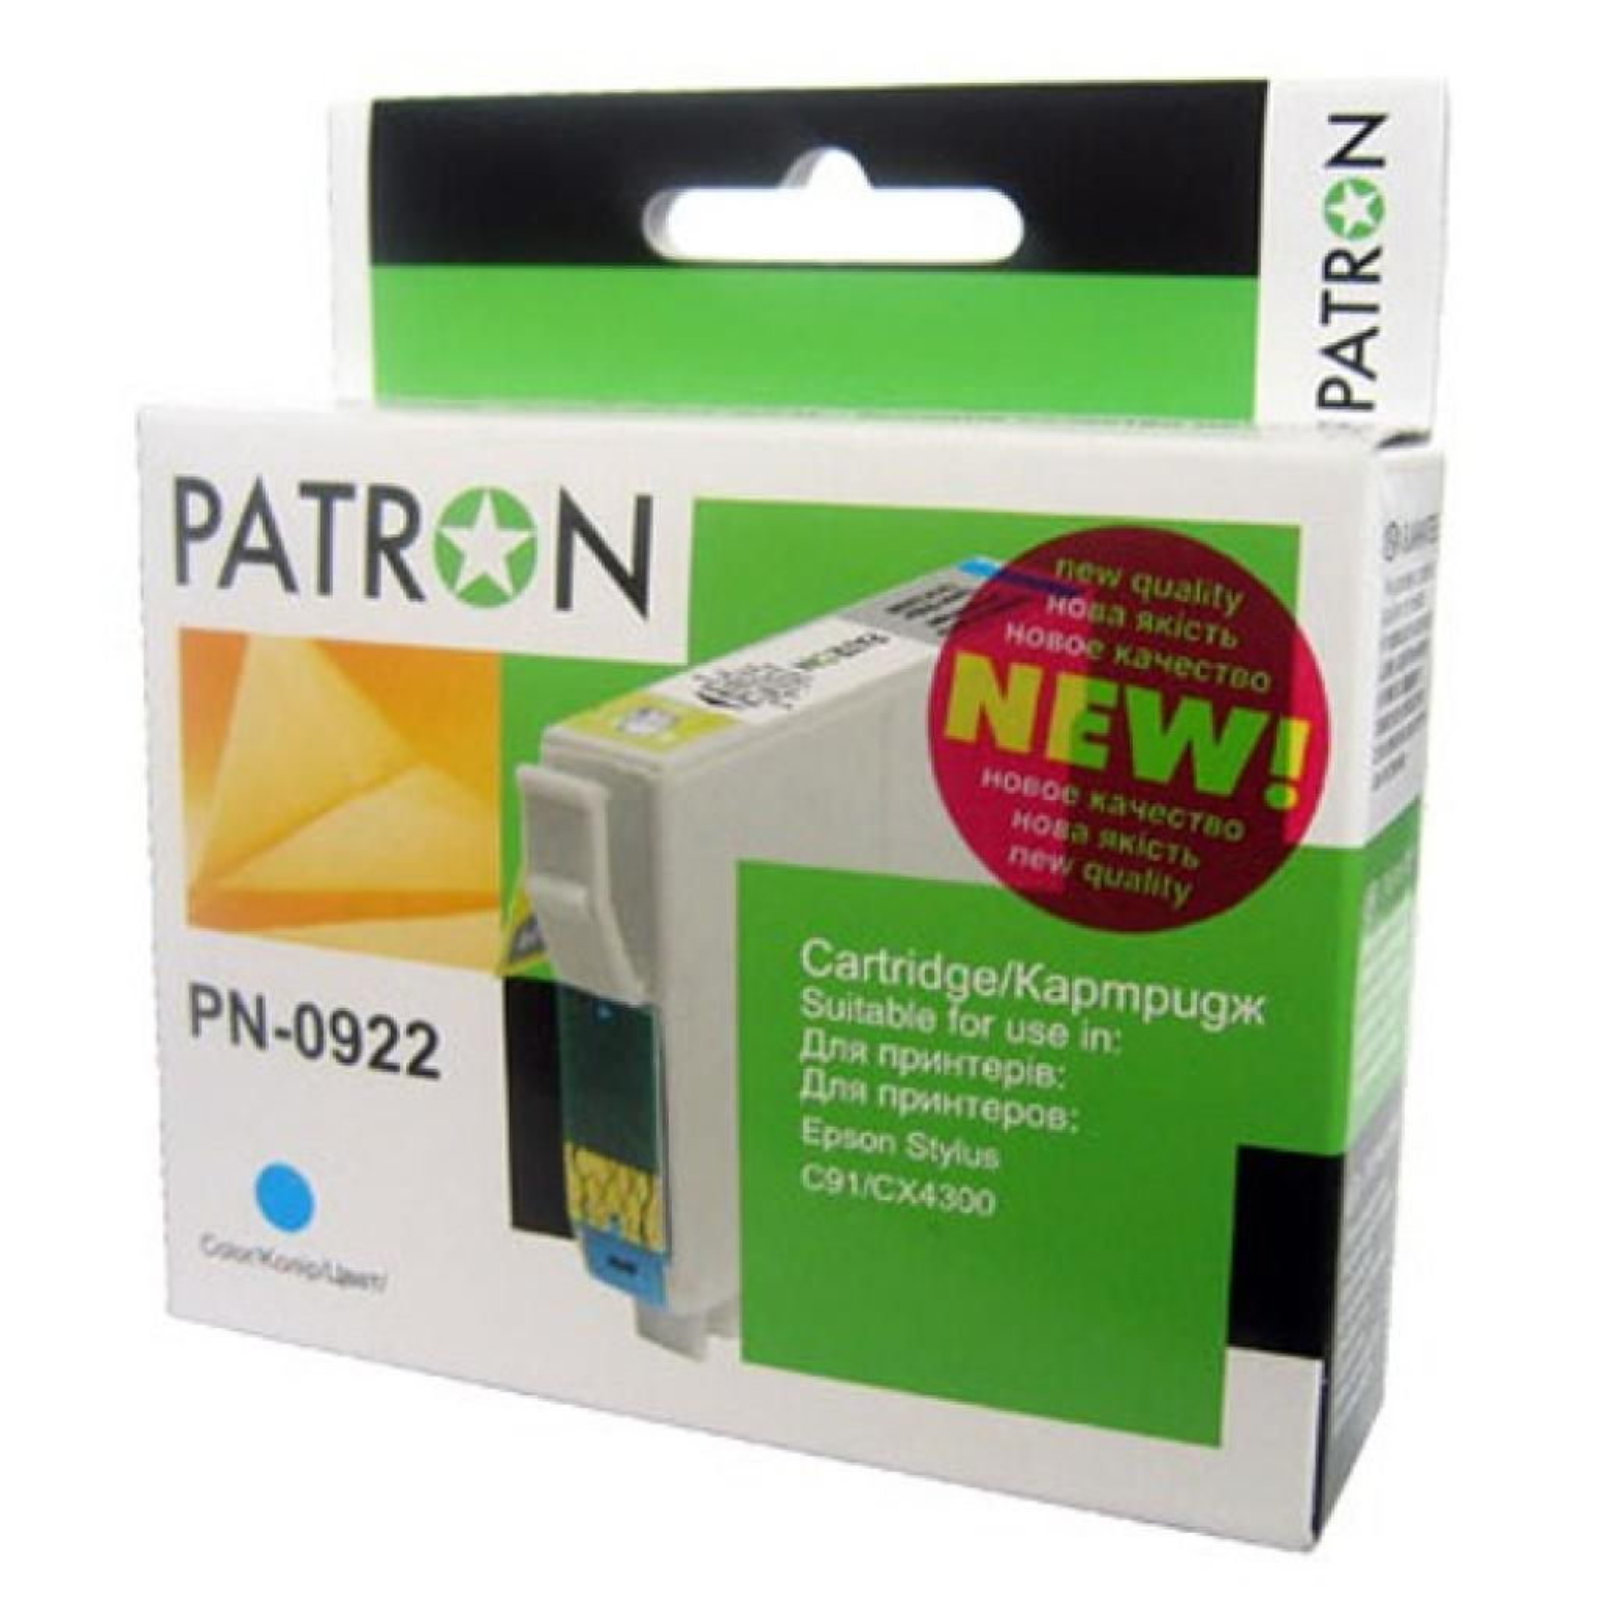 Картридж PATRON для EPSON C91/T26/27/TX106 cyan (CI-EPS-T09224A-C2-PN) изображение 2